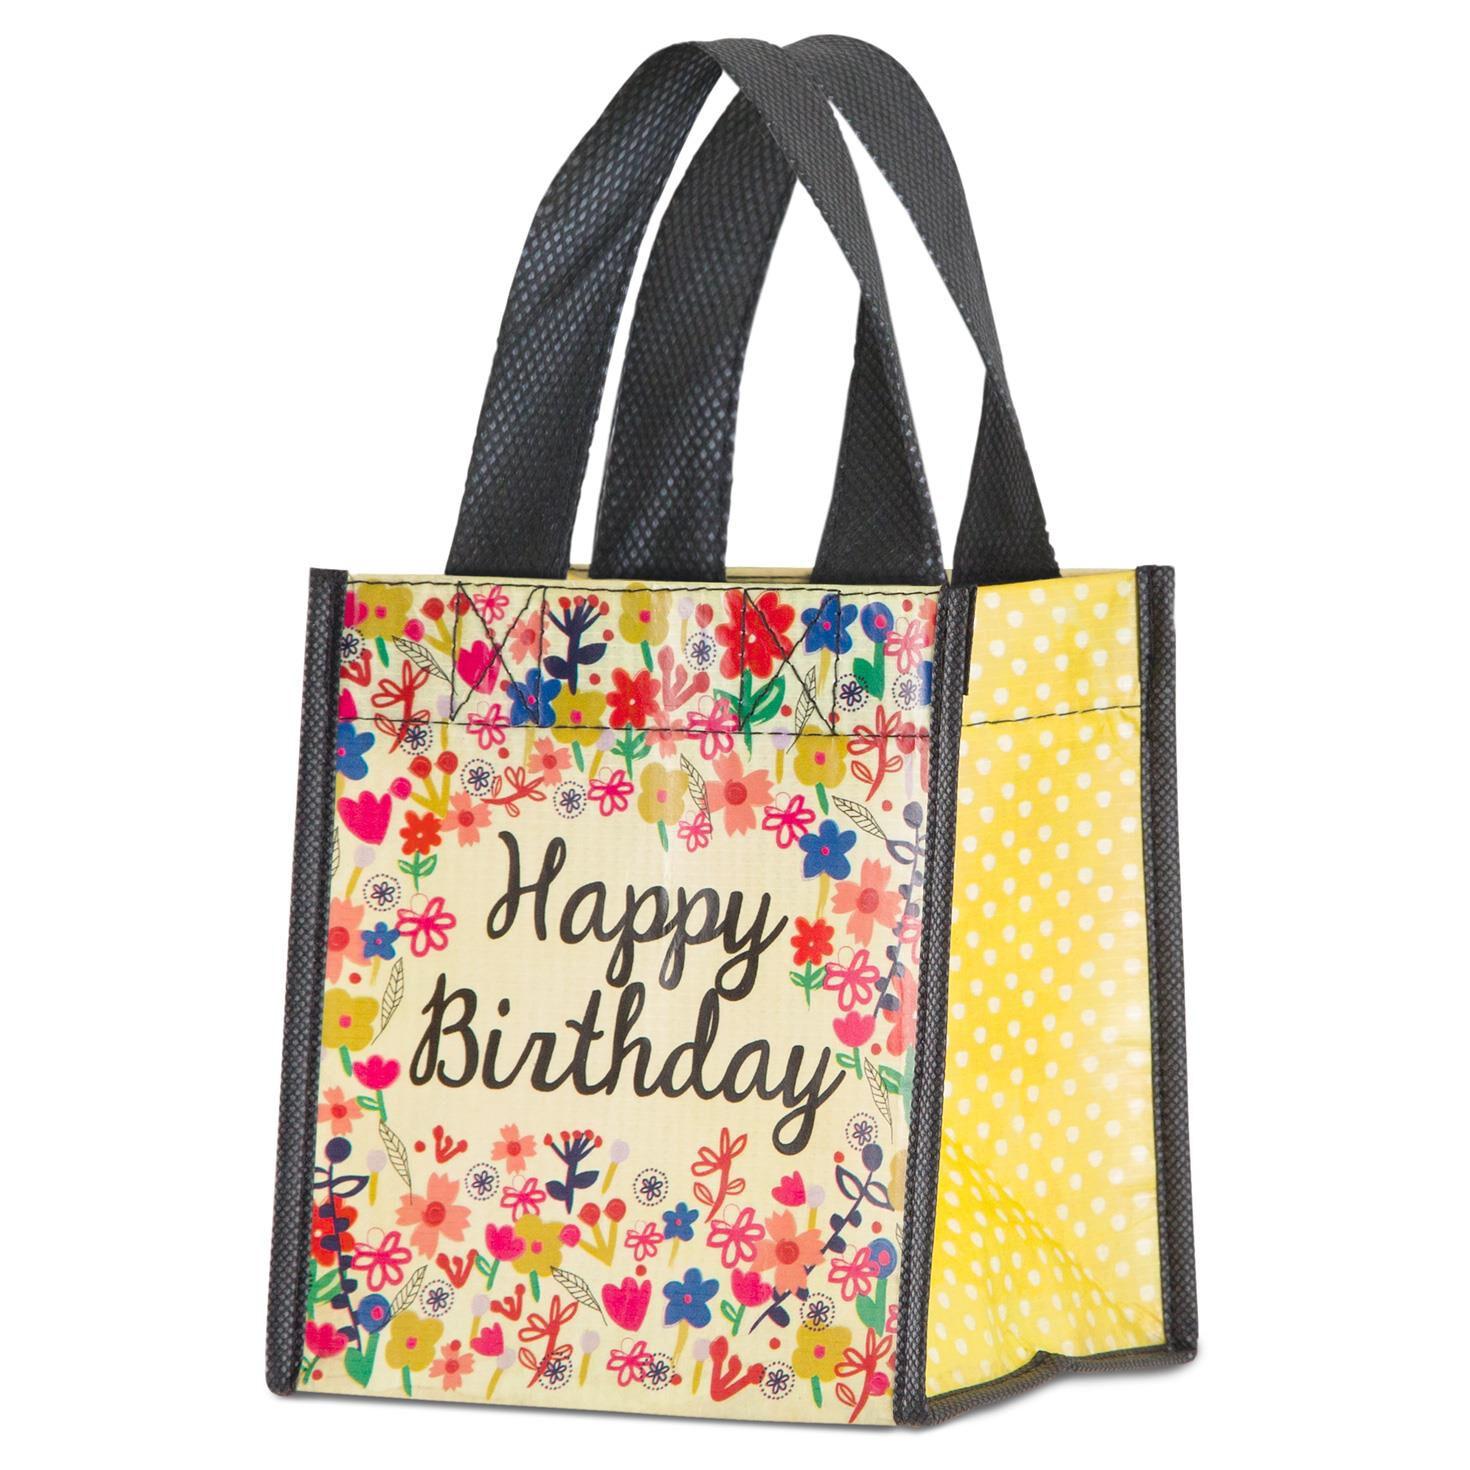 Natural life happy birthday gift bag cream small handbags natural life happy birthday gift bag cream small handbags purses hallmark negle Image collections